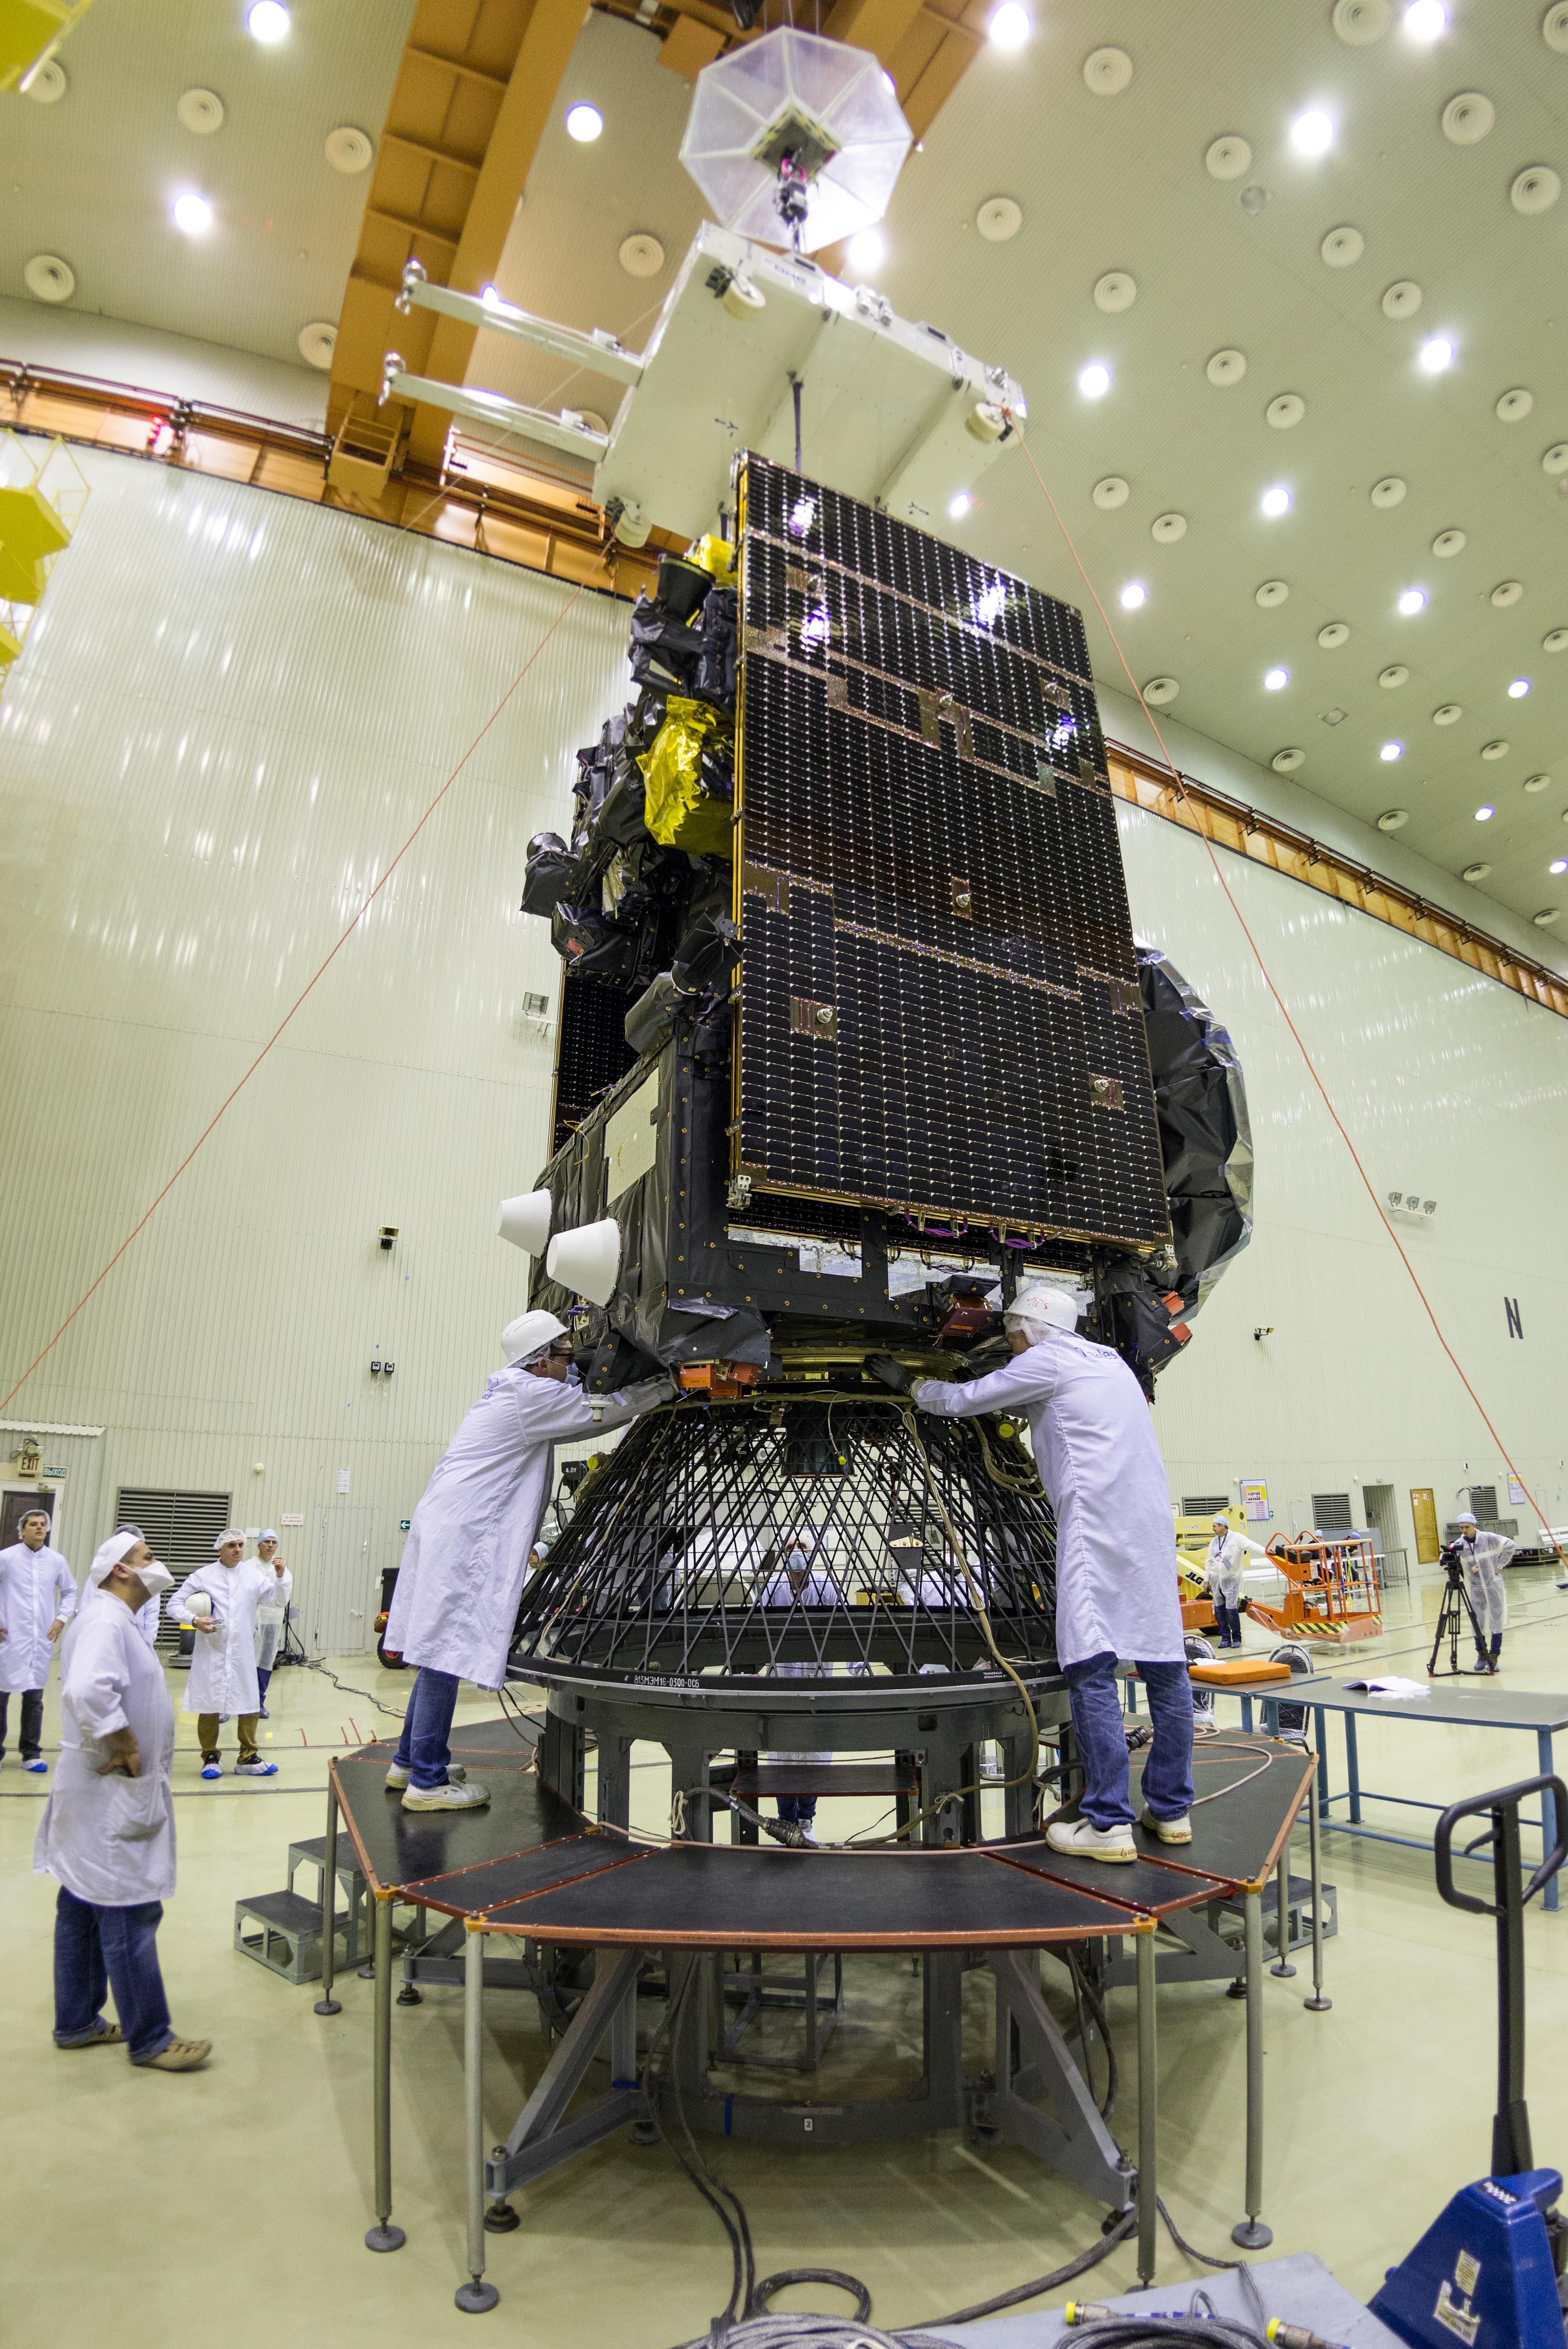 ExoMars_160105-LC-AIT-62px_orig.jpg